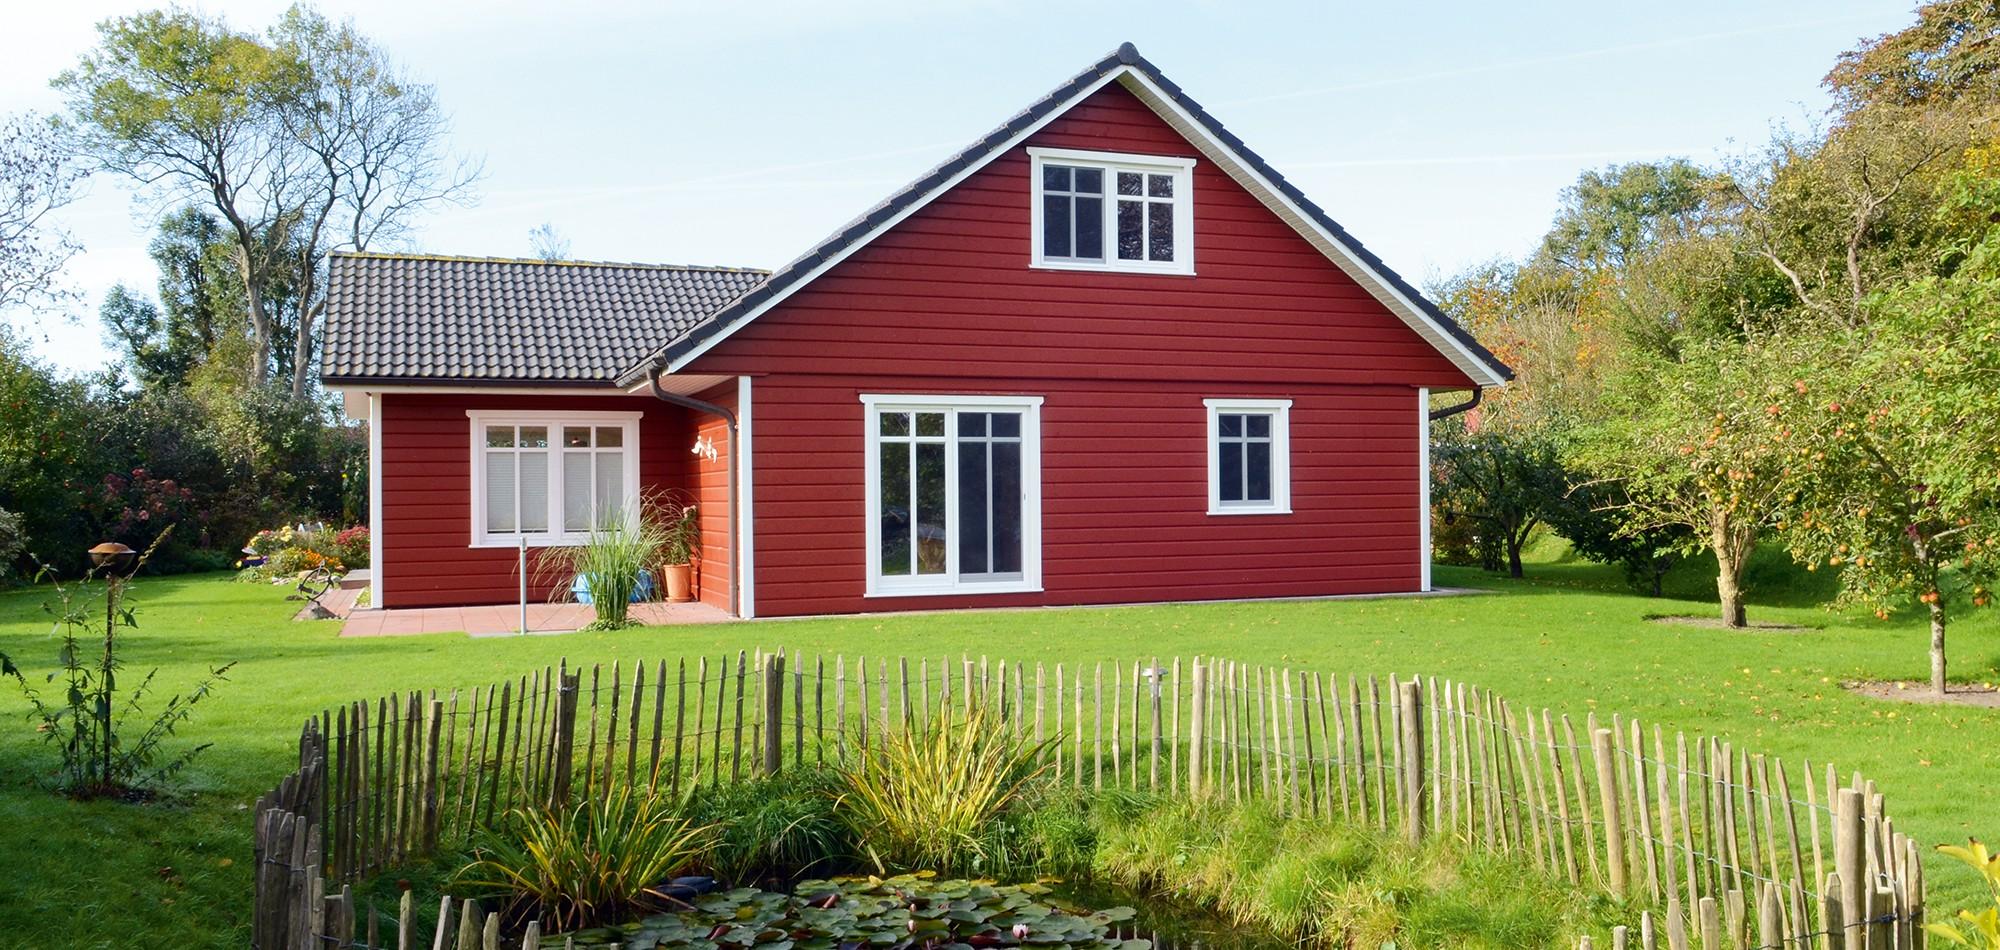 einfamilienhaus 1 5 geschossig l ngenhorn holzh user zimmerei richardsen langenhorn. Black Bedroom Furniture Sets. Home Design Ideas